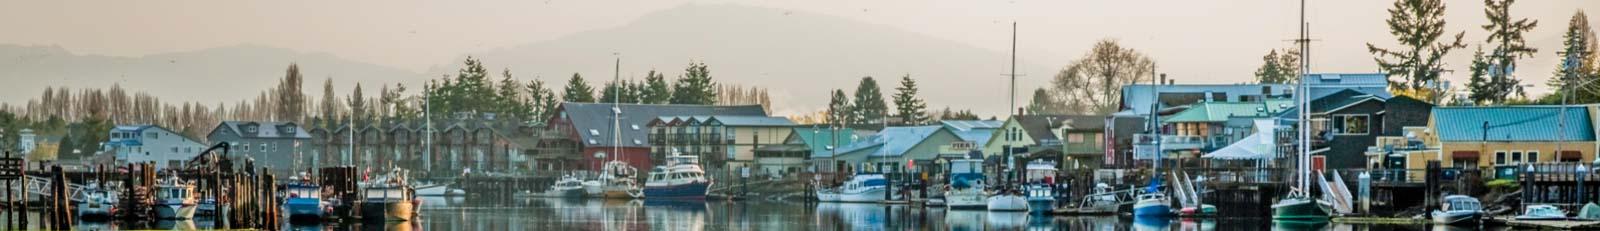 Skagit County Waterfront Market Statistics